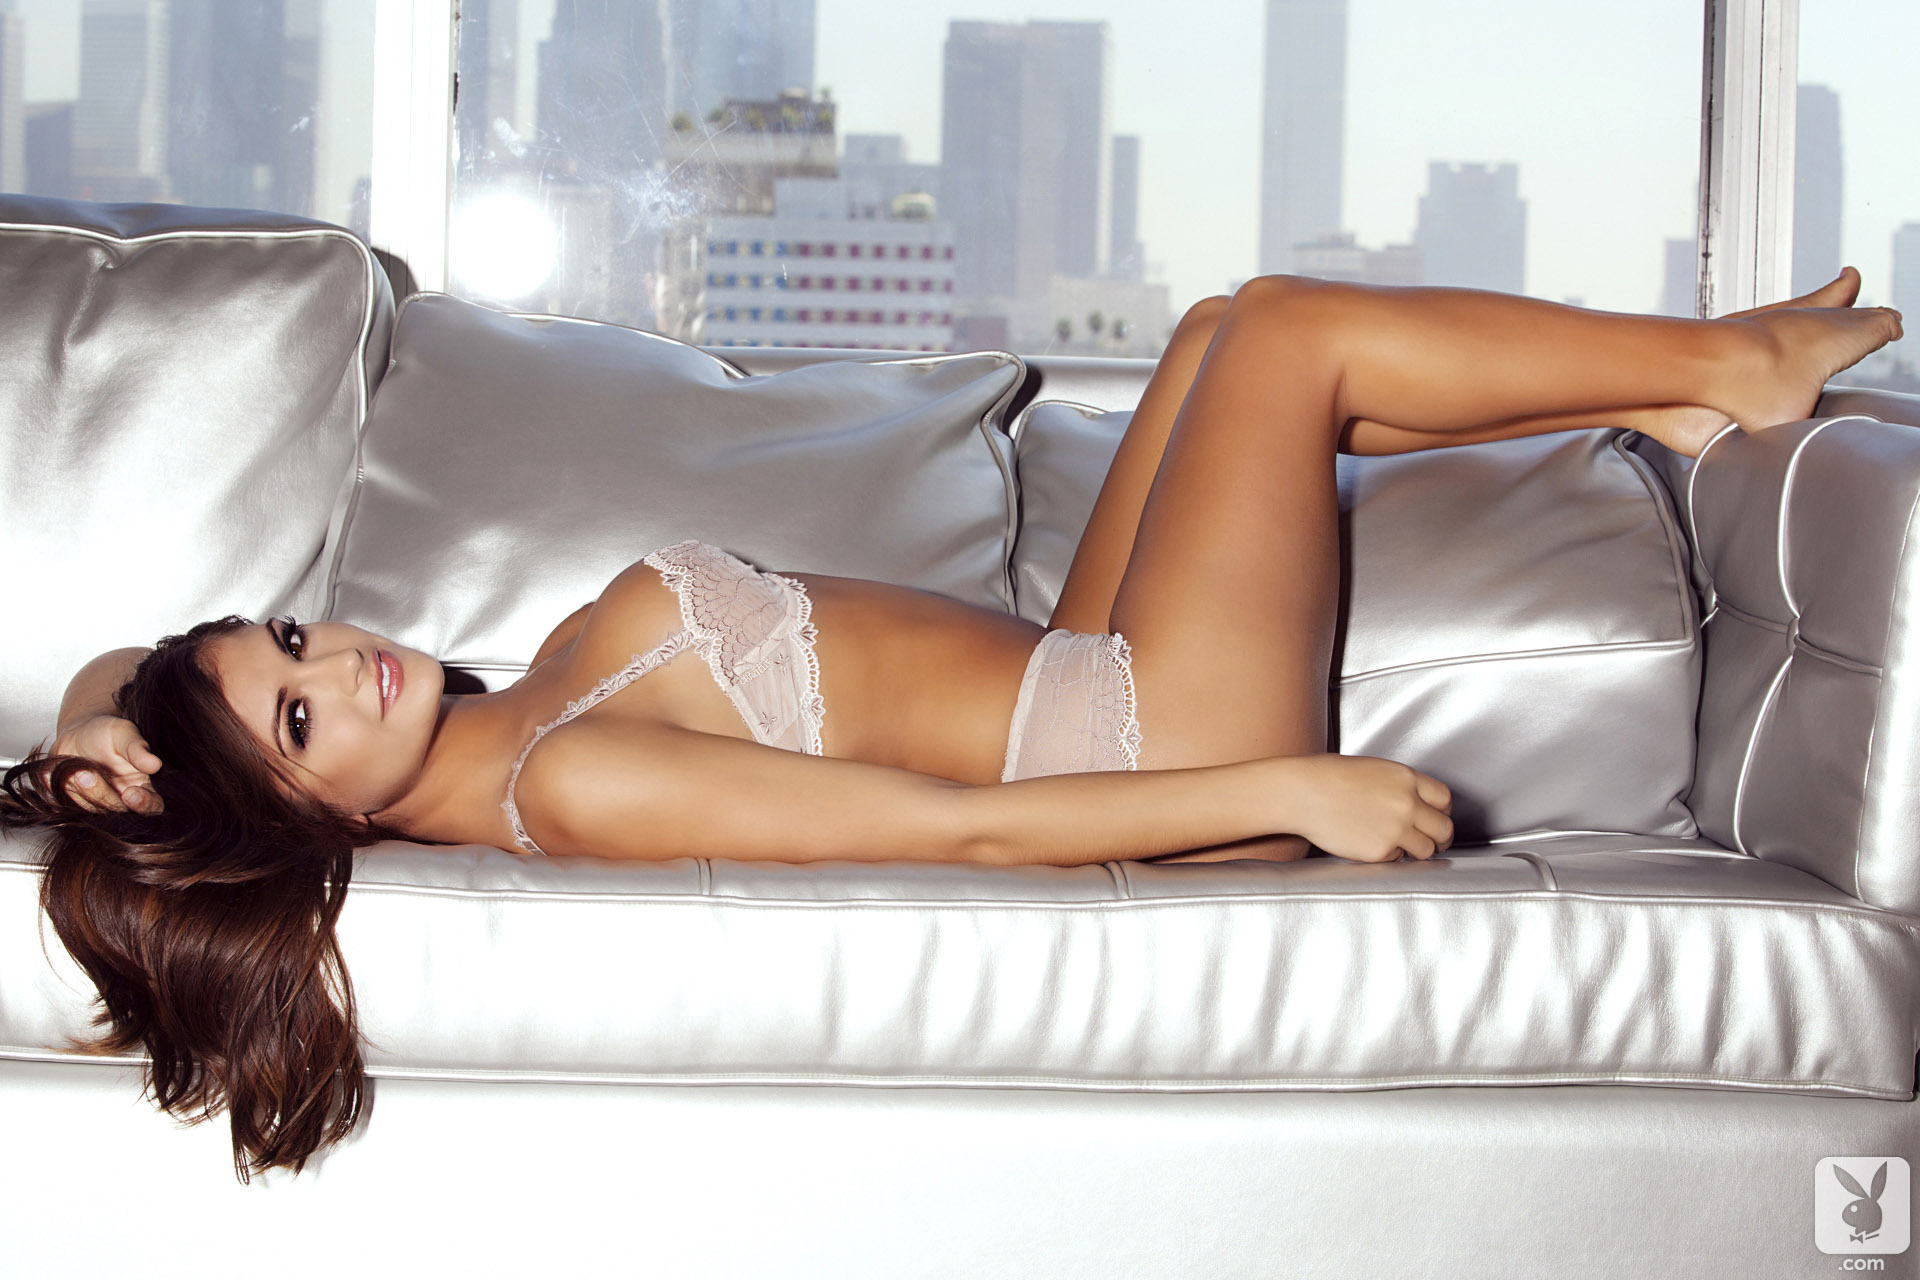 Секс на новом диване фото 8 фотография